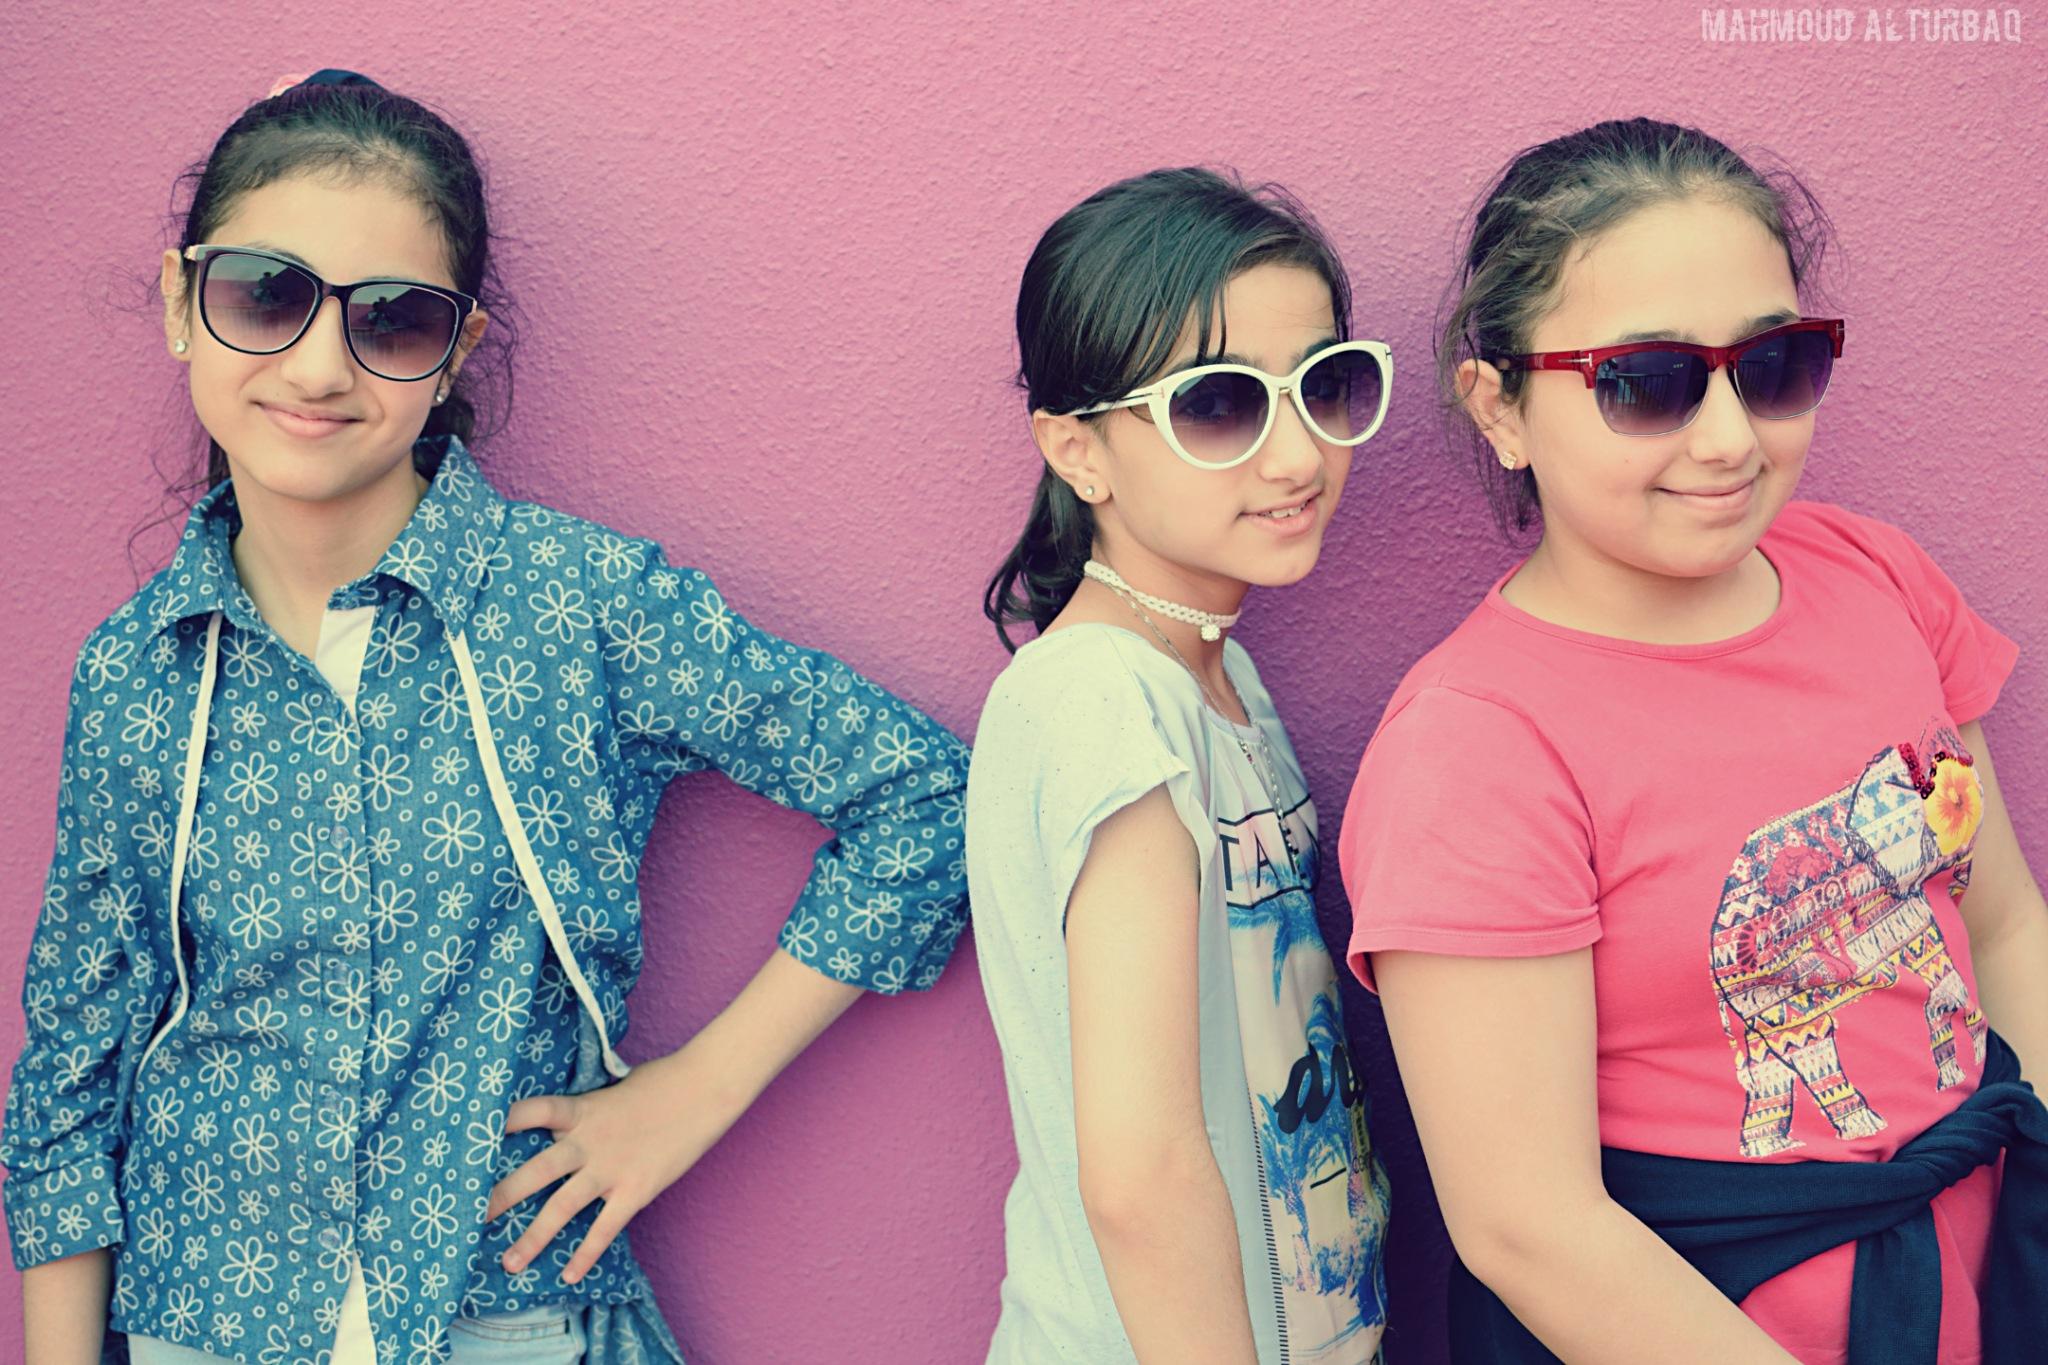 little models  by Mahmoud Alturbaq